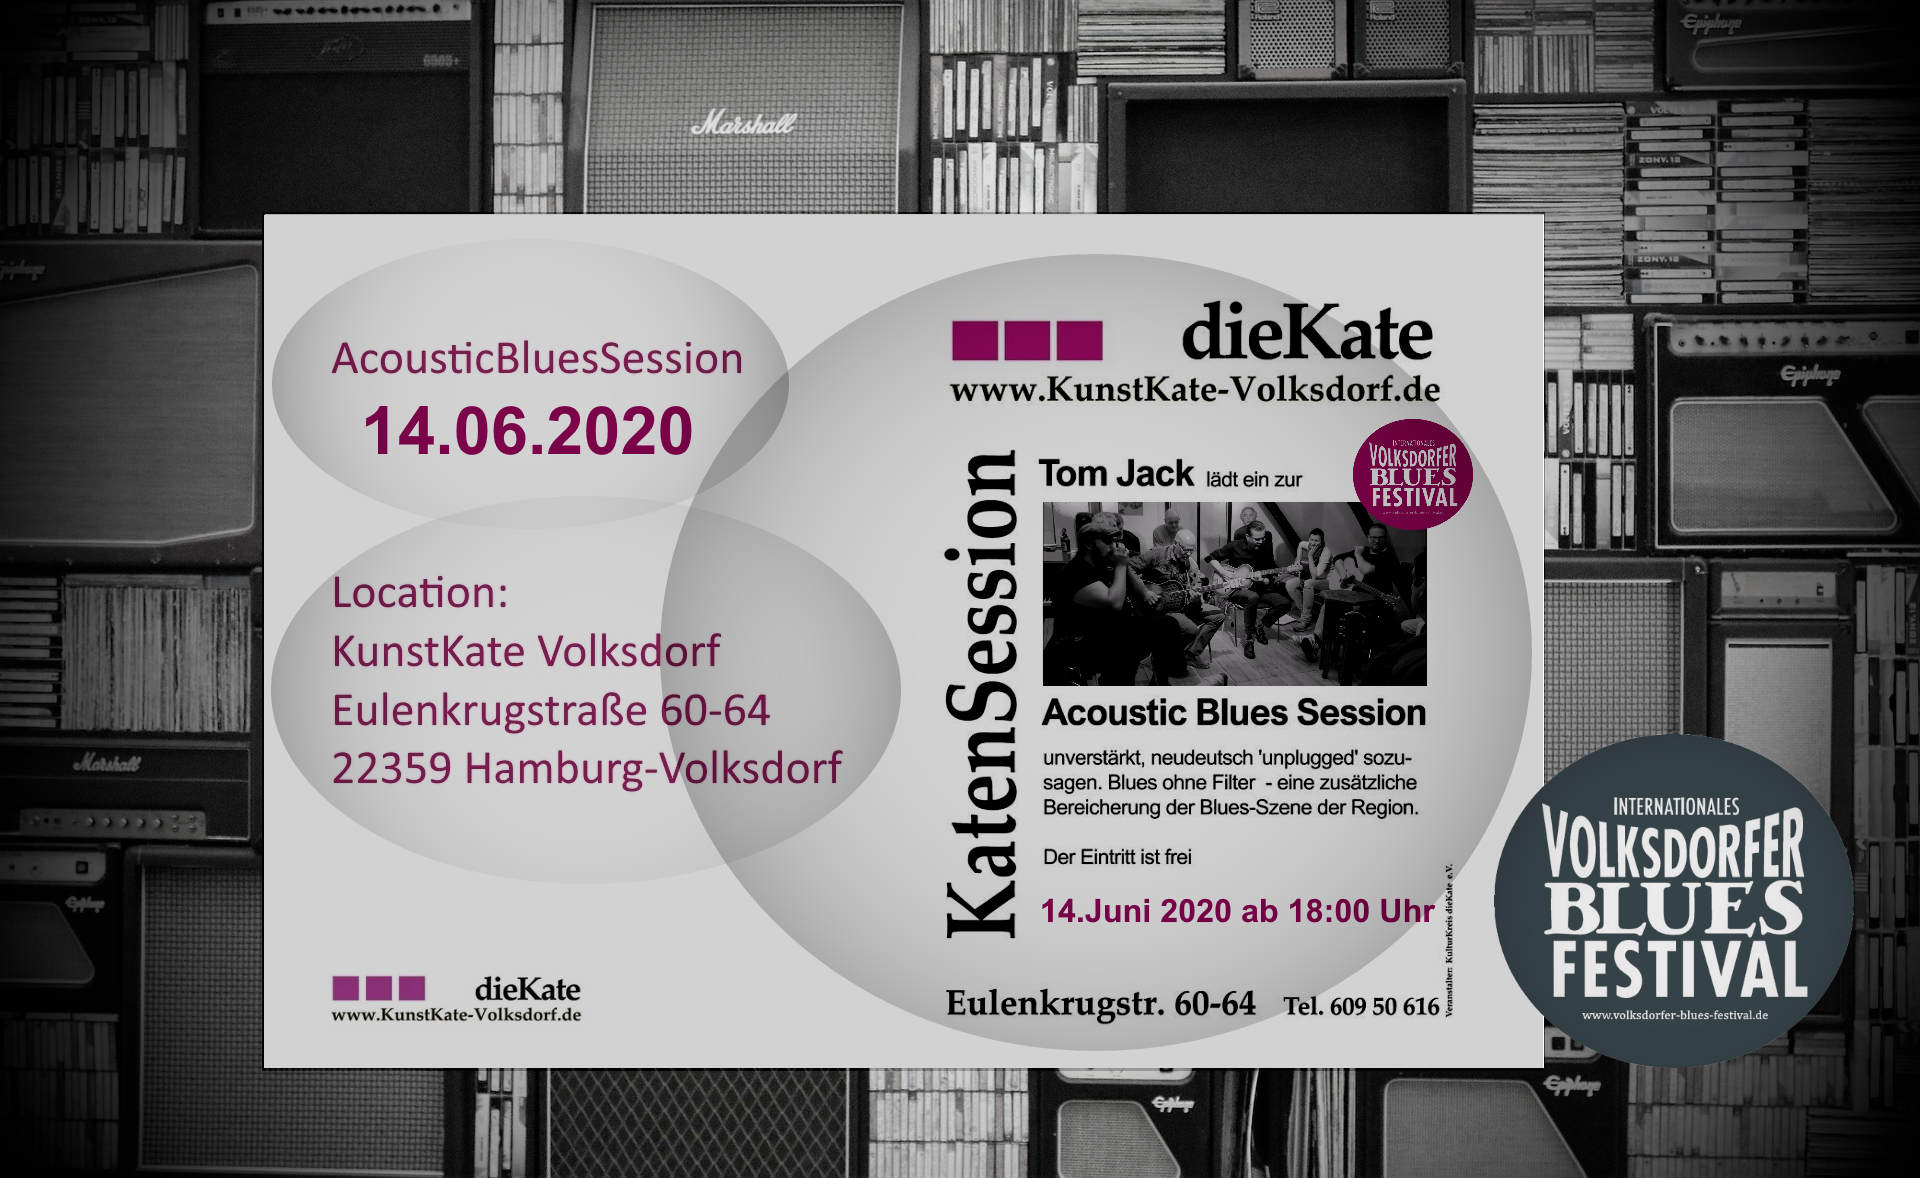 14.06.2020 – Acoustic Blues Session (ABS) – KunstKate Volksdorf